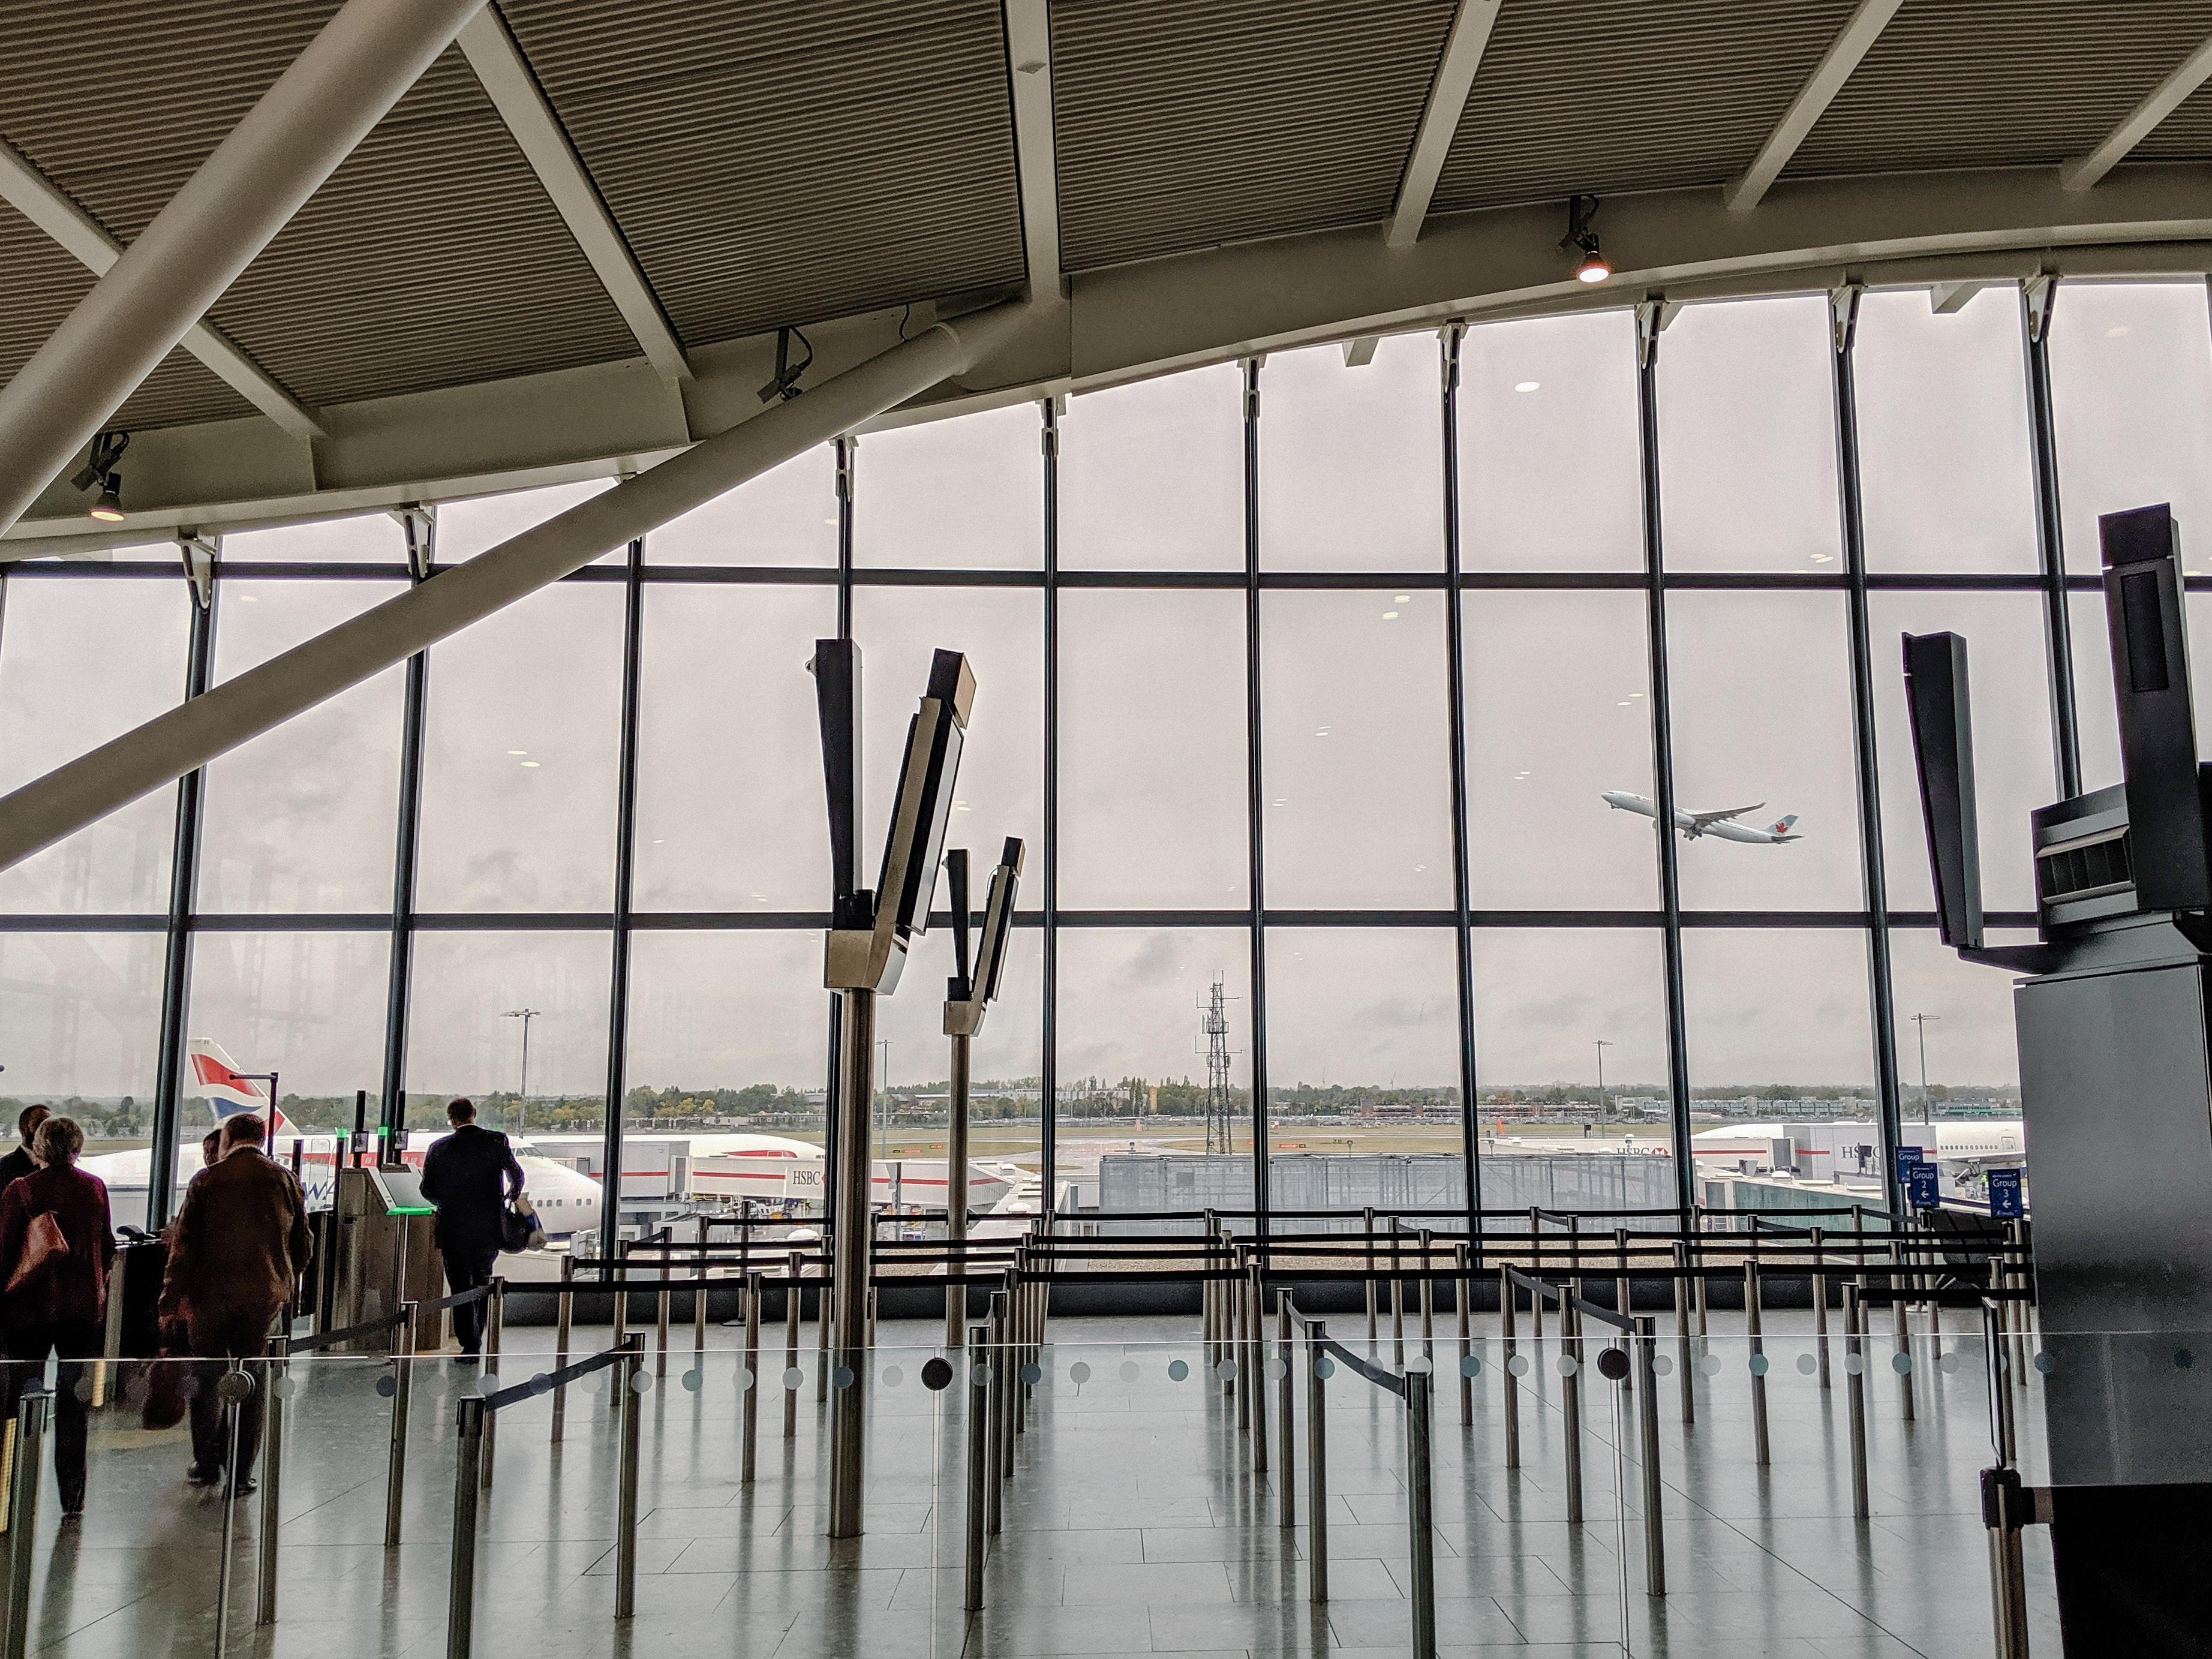 Scrumconnect wins bid at HM Passport Office (HMPO)